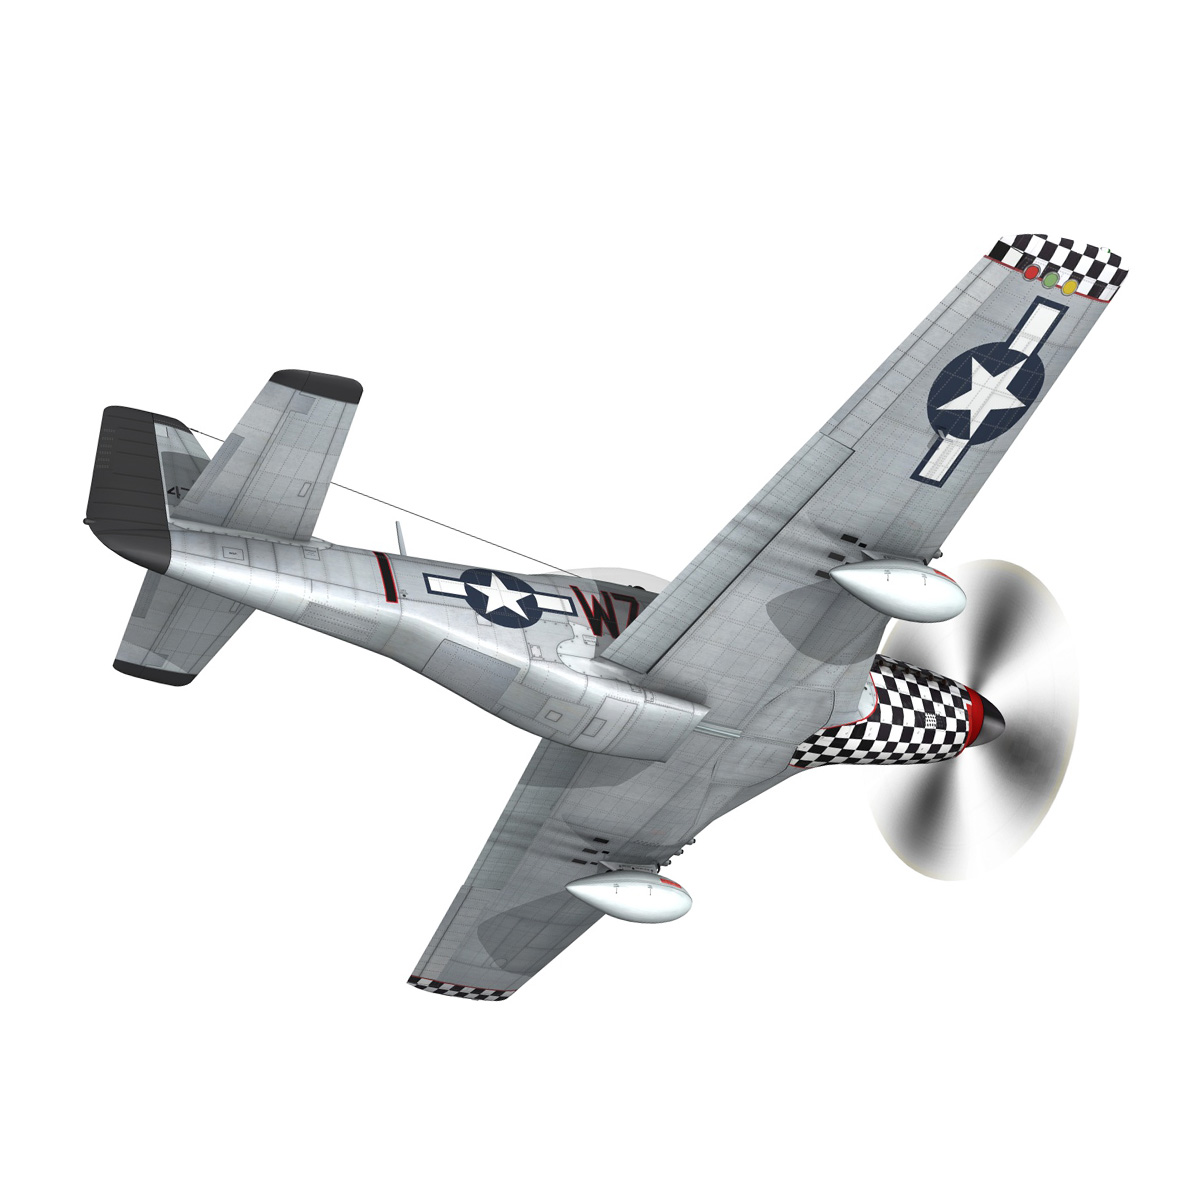 north american p-51d mustang – big beautiful doll 3d model fbx c4d lwo obj 282557